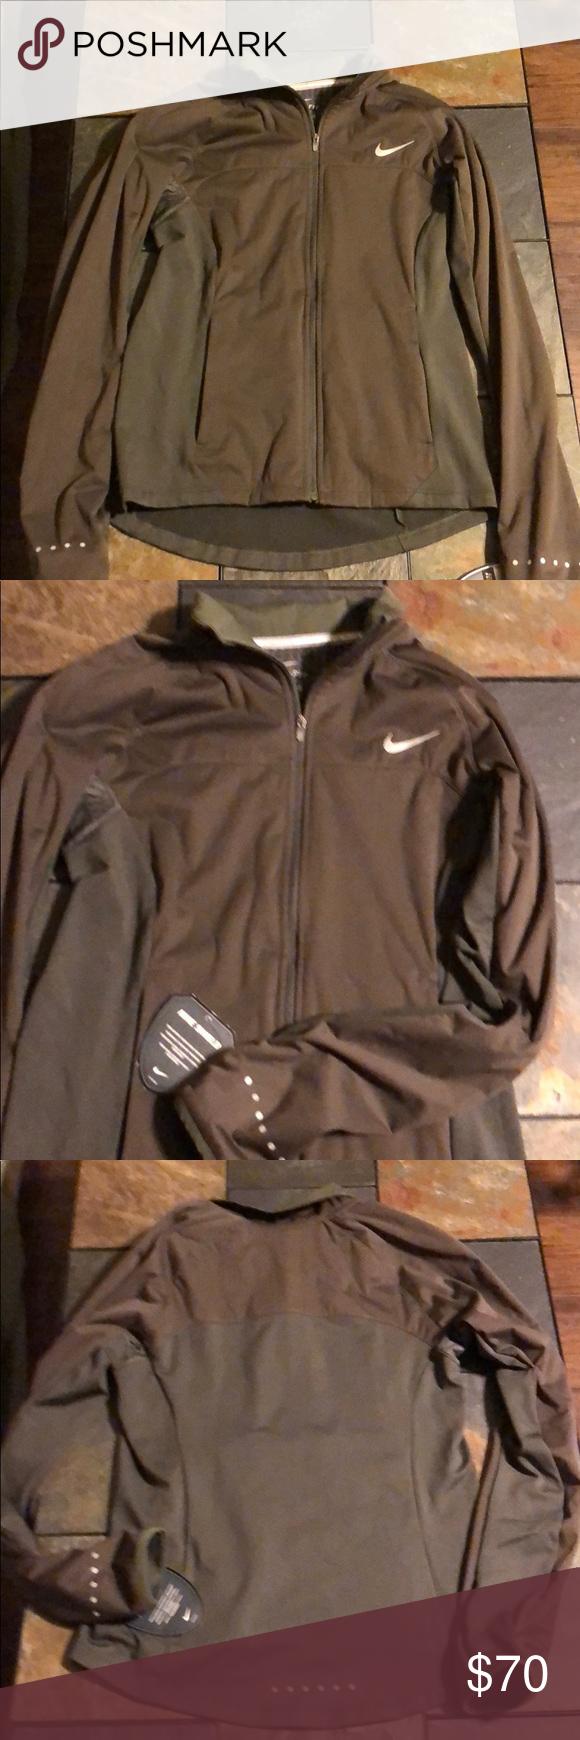 Nike dri-fit thermal jacket size small Women s element shield 2.0 jacket  running jacket. light lining. reflective material at wrist  6aeb3c5b1